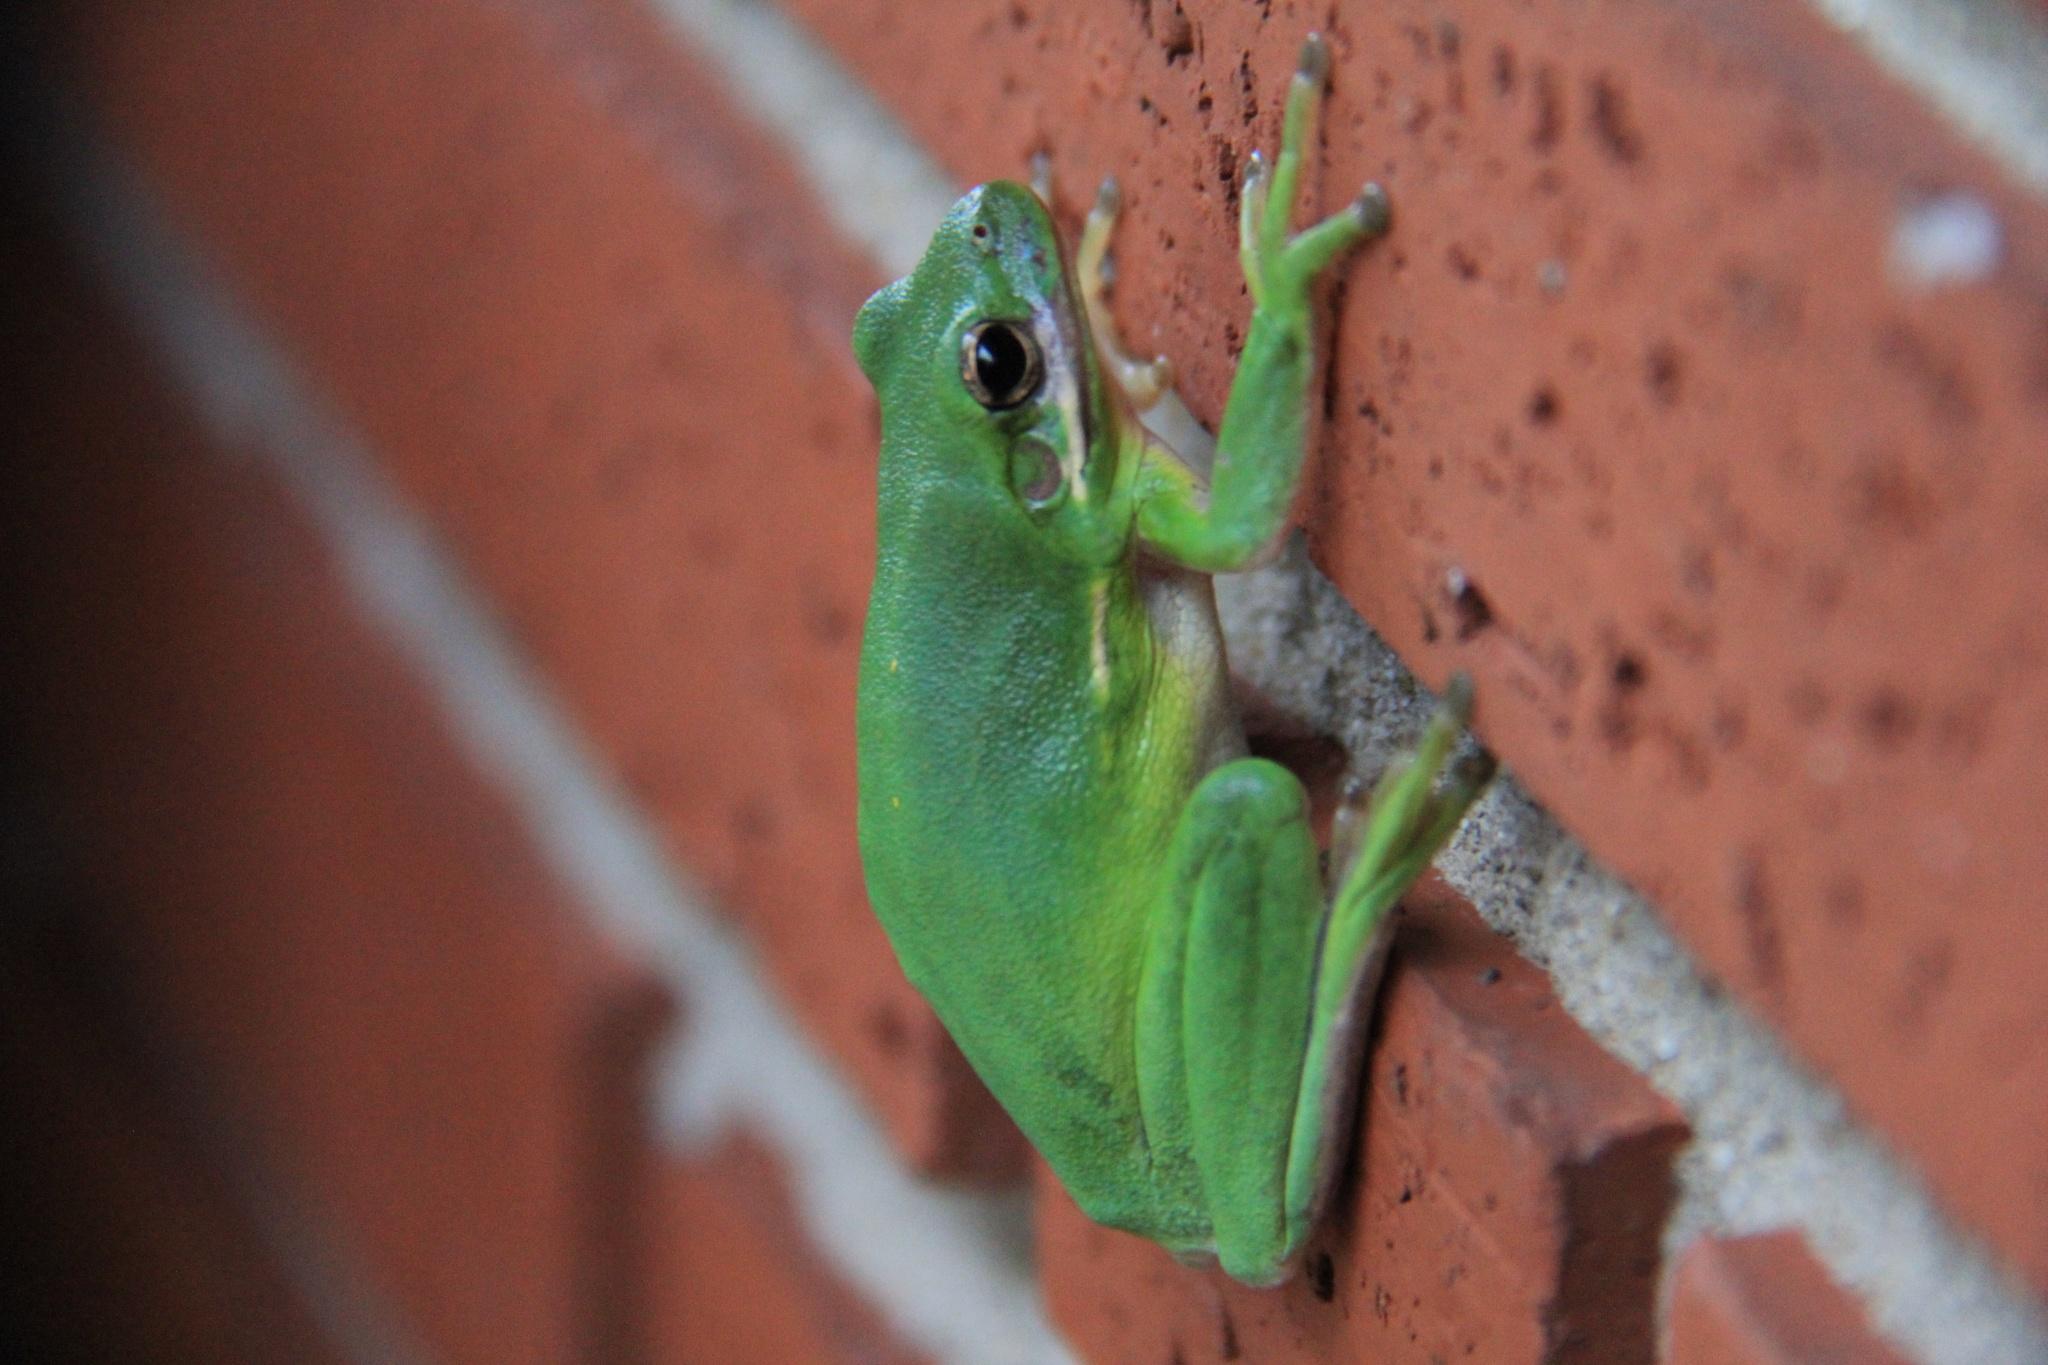 Tree Frog by daniellsmithjr